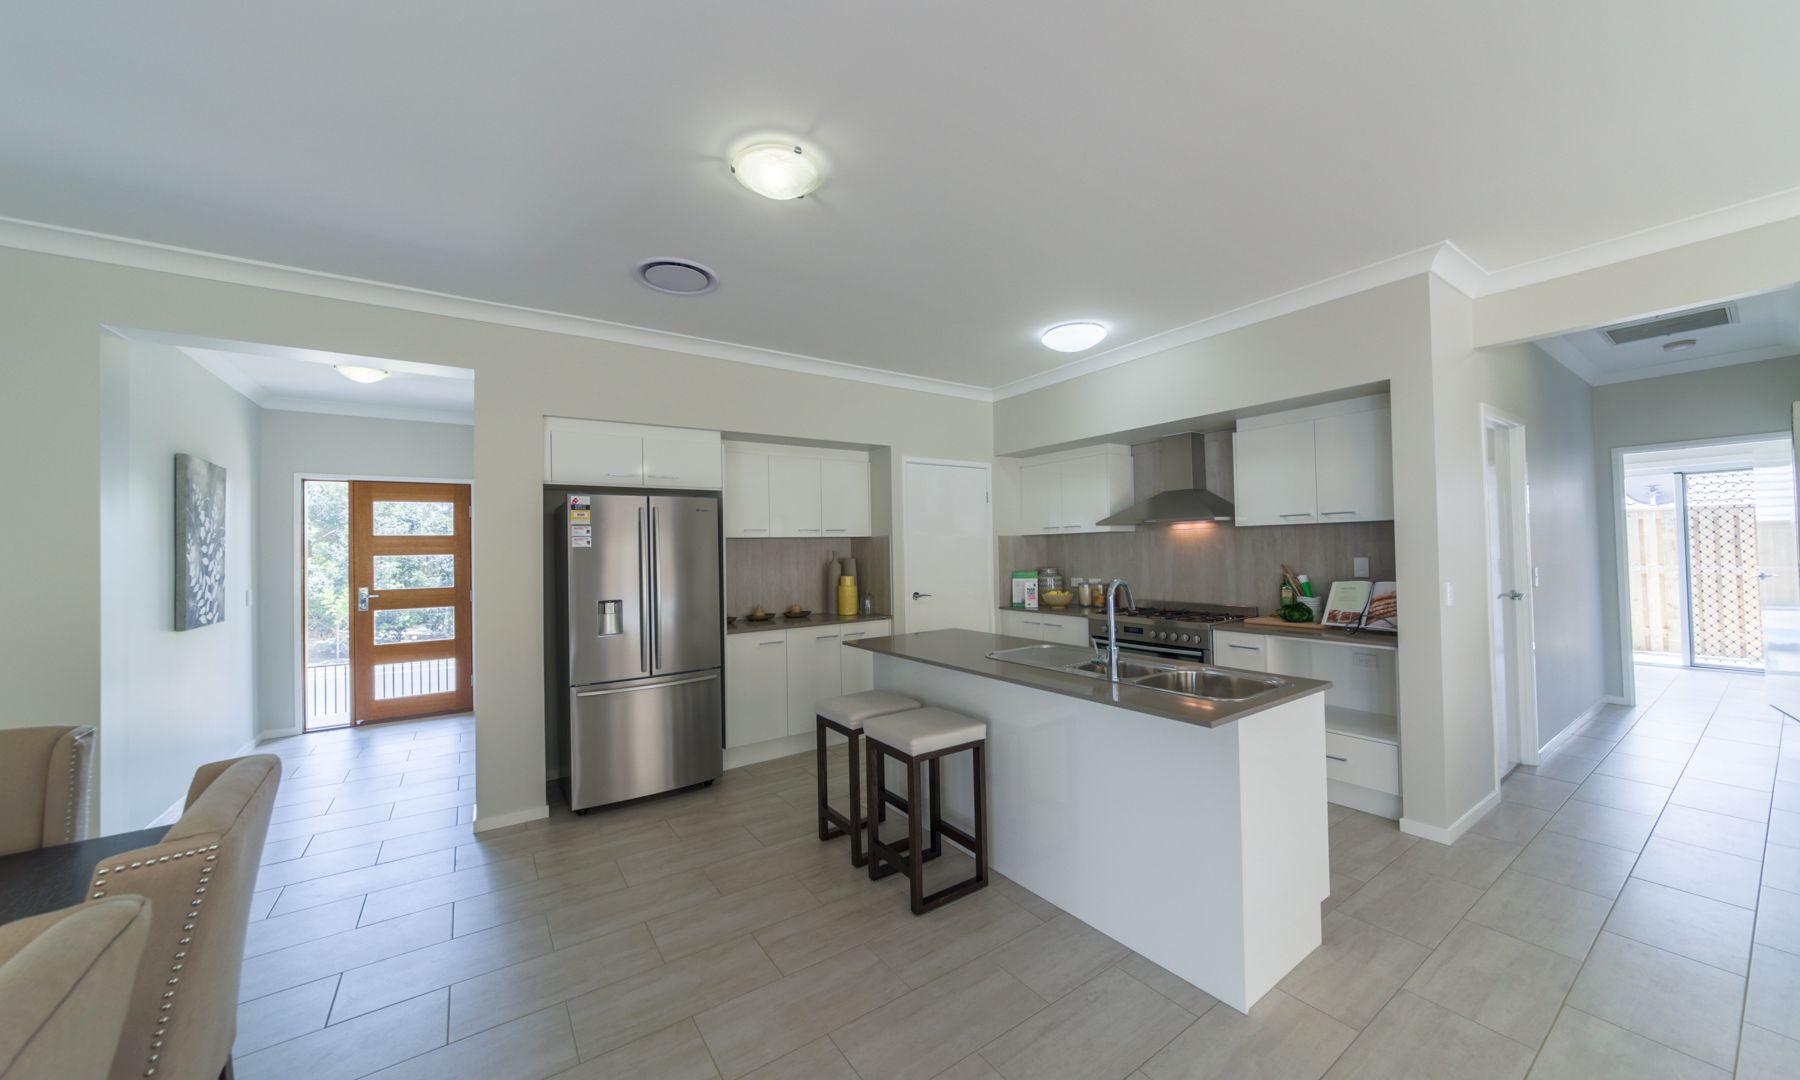 Lot 2 Bradman Drive, Boorooma NSW 2650, Image 2